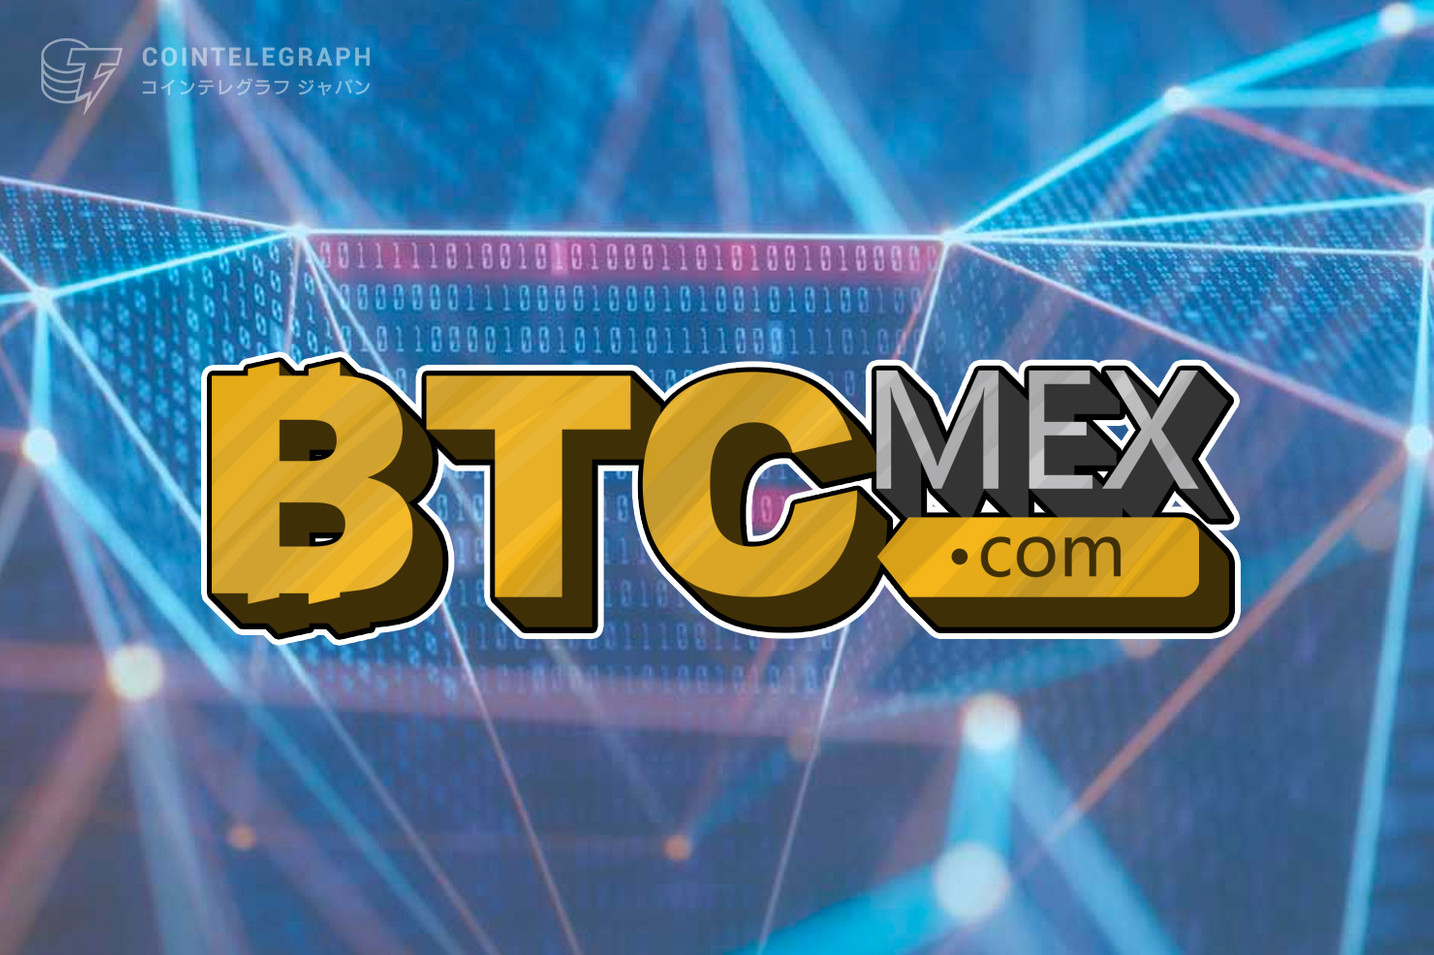 BitMEXへの挑戦: BTCMEXは最高のbotトレード環境を提供